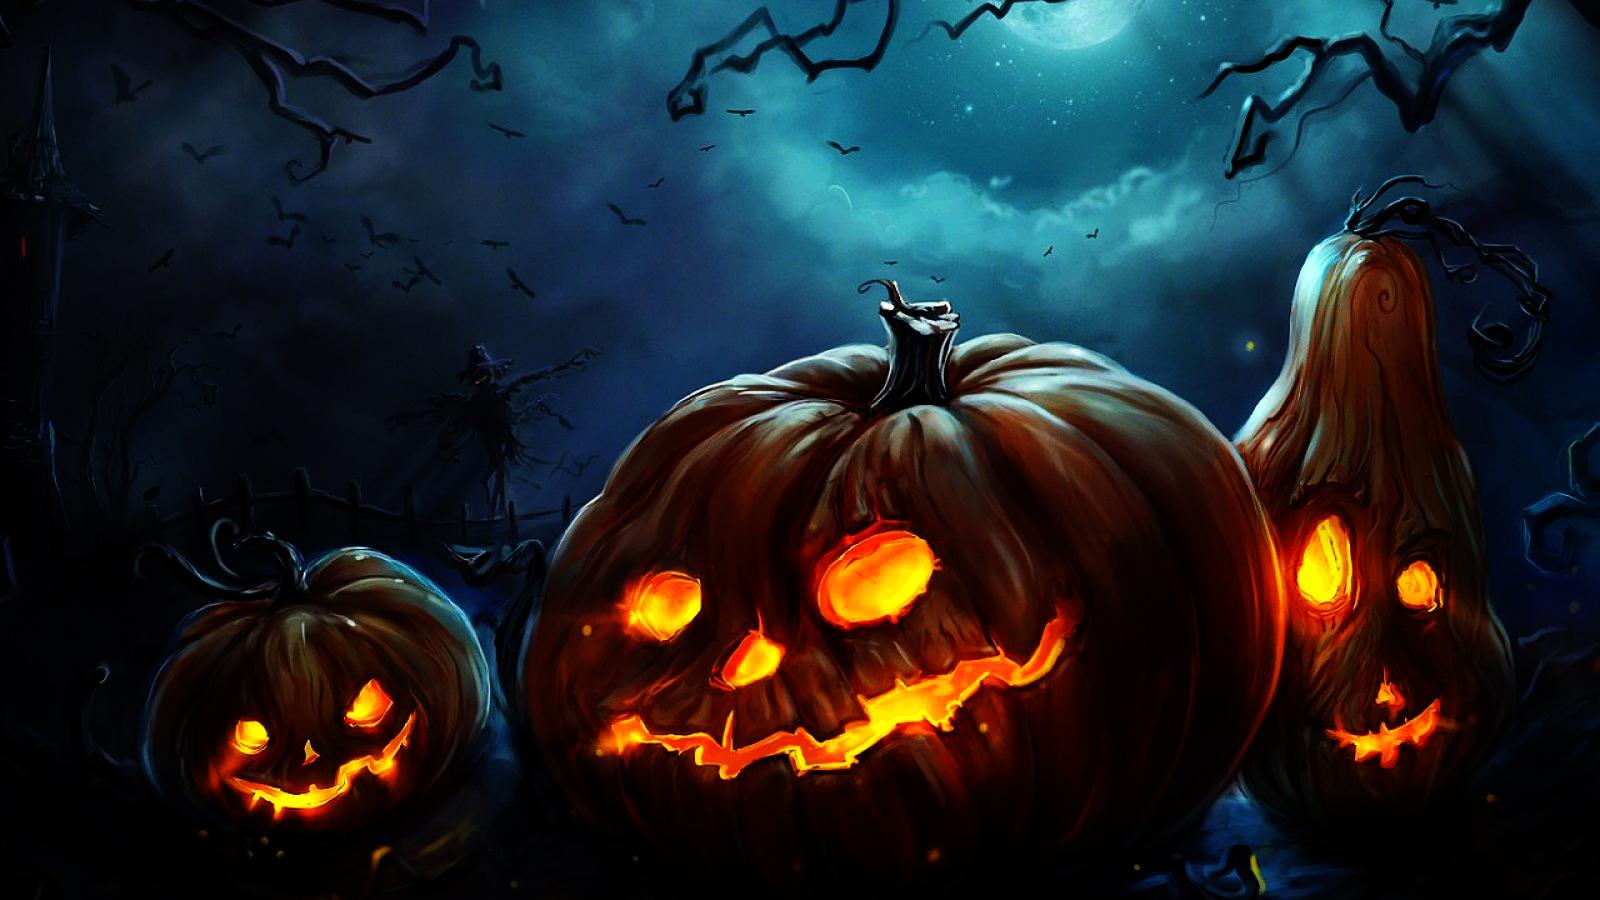 Happy Halloween Pumkins Fire HD Wallpaper   StylishHDWallpapers 1600x900